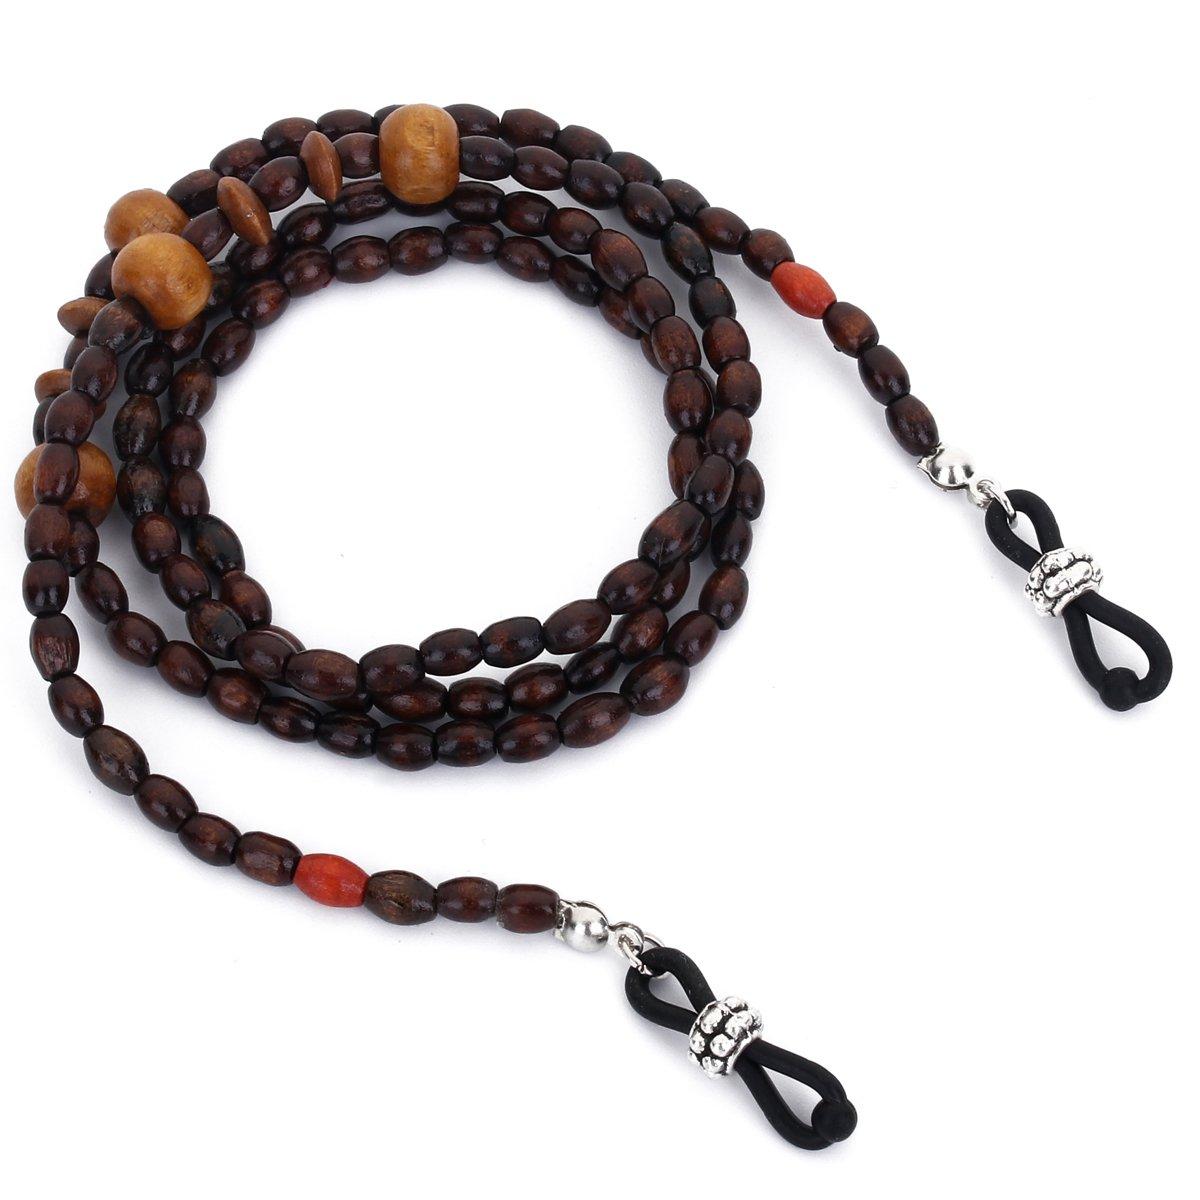 Mini Tree Wood Bead Eyeglass Chain Sunglasses Strap Reading Glasses Holder (Brown)